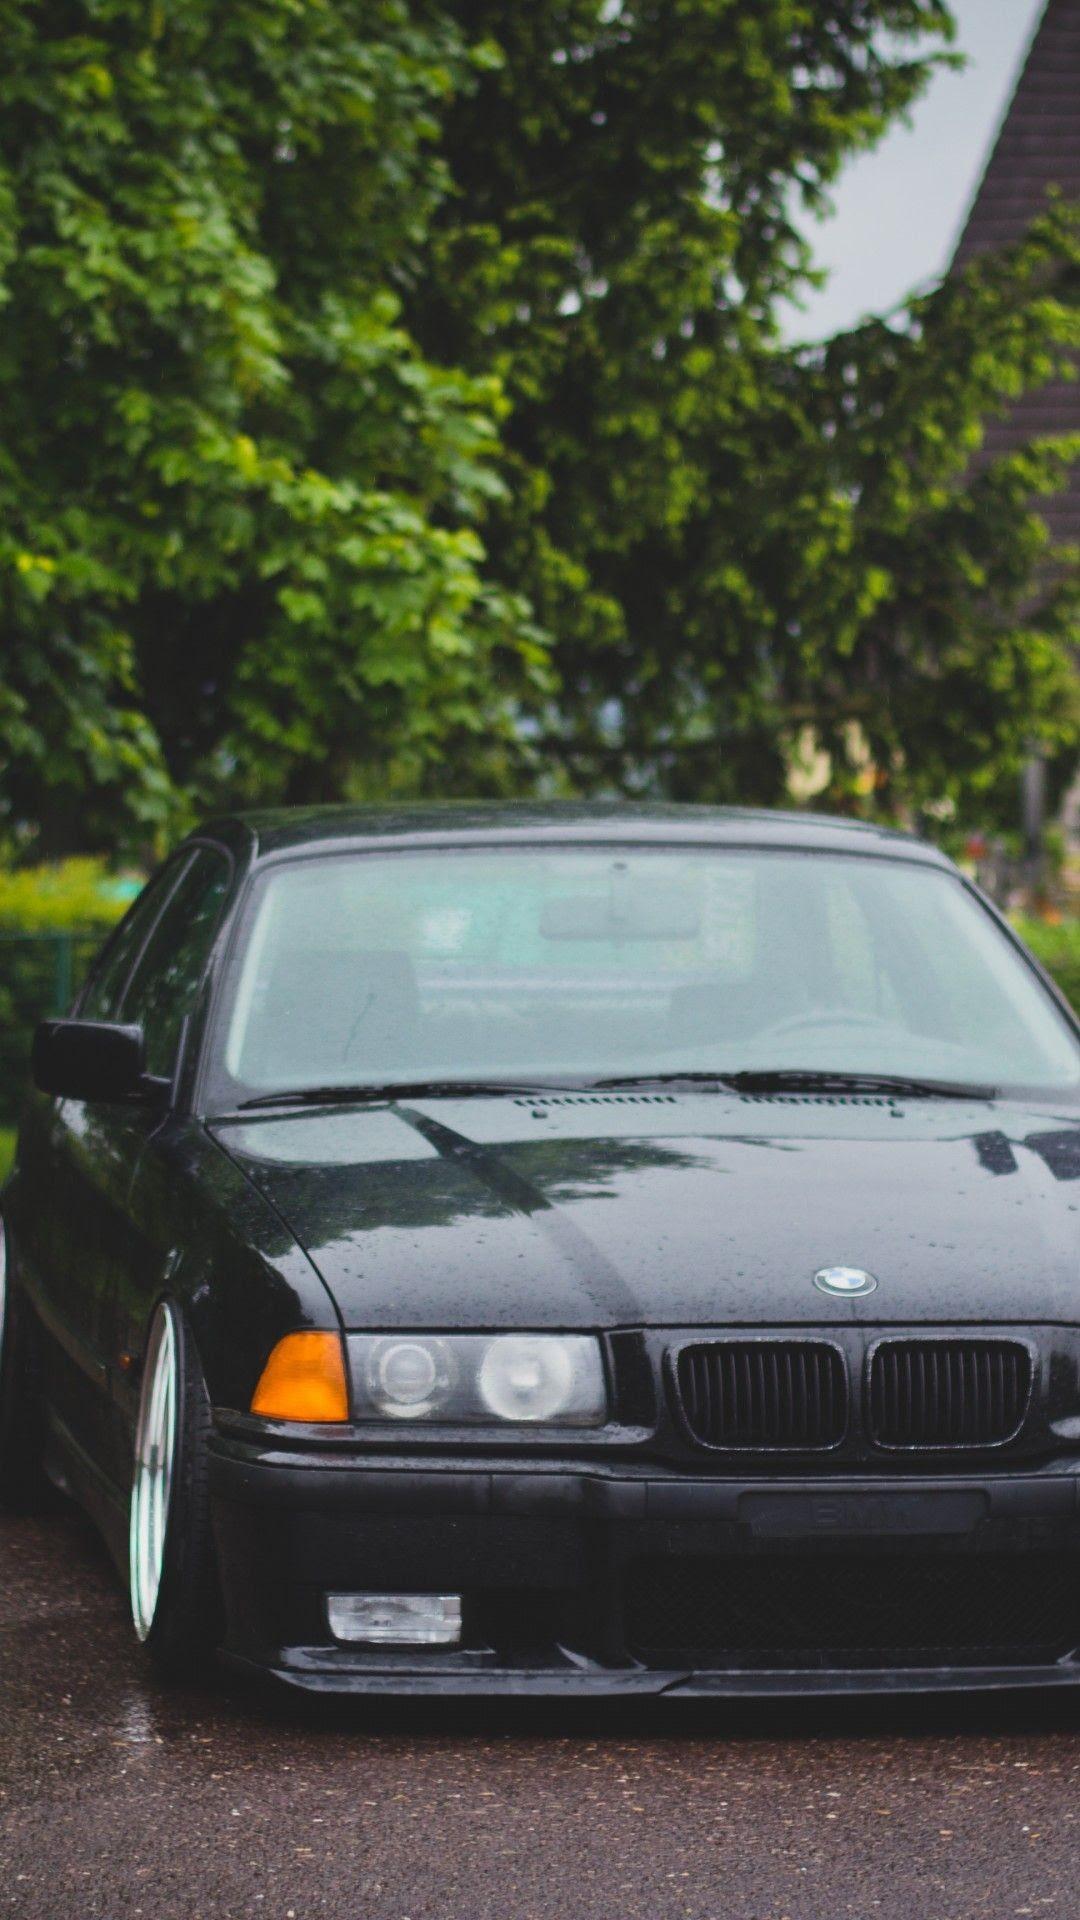 BMW E36 M3 Wallpaper (64+ images)